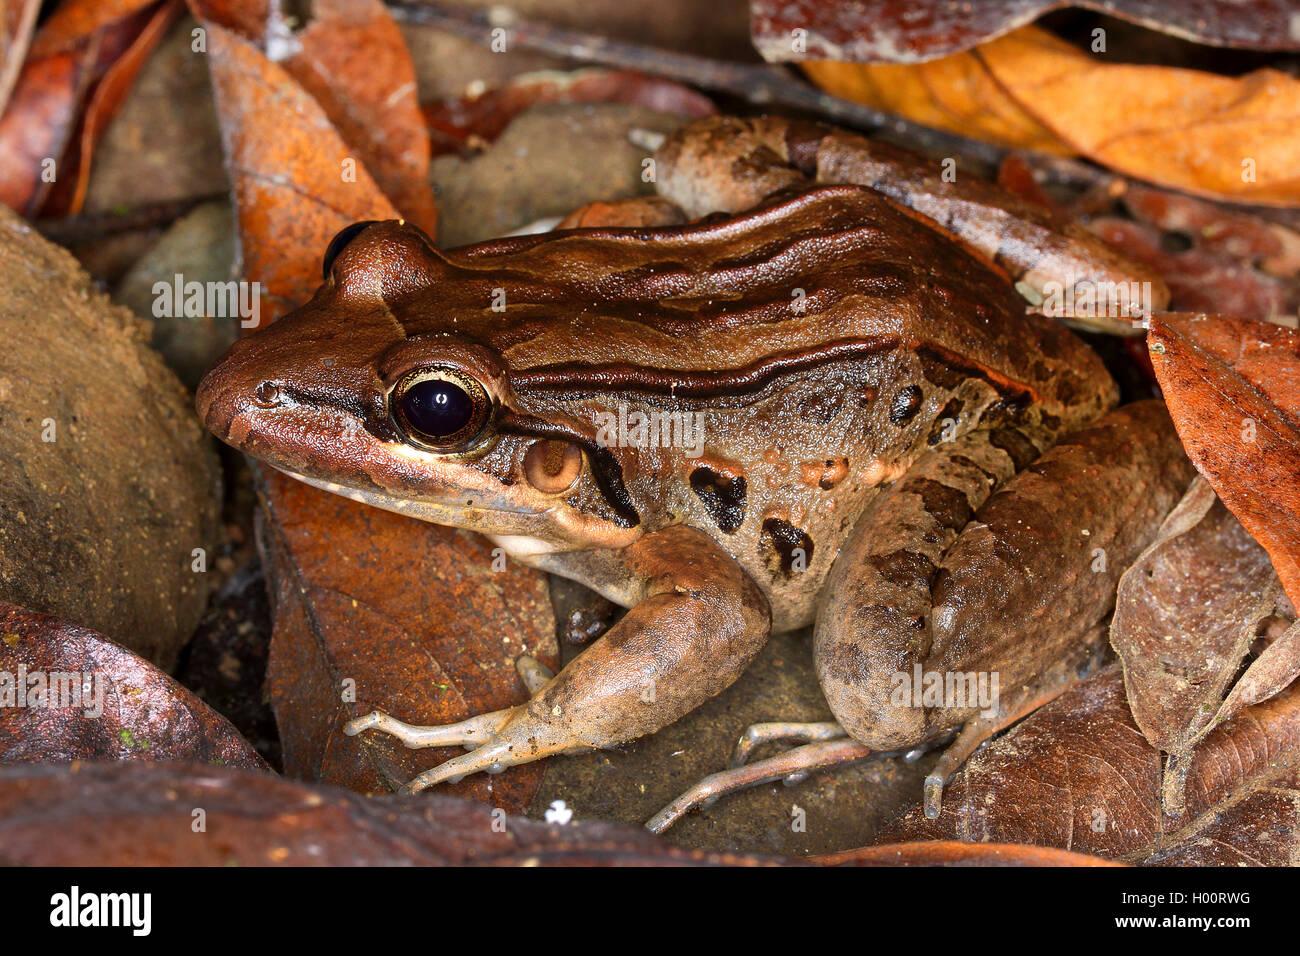 Forrers Grasfrosch (Lithobates forreri, Rana forreri), auf Falllaub, Costa Rica | Forrer's Leopard Frog, Forrer's - Stock Image